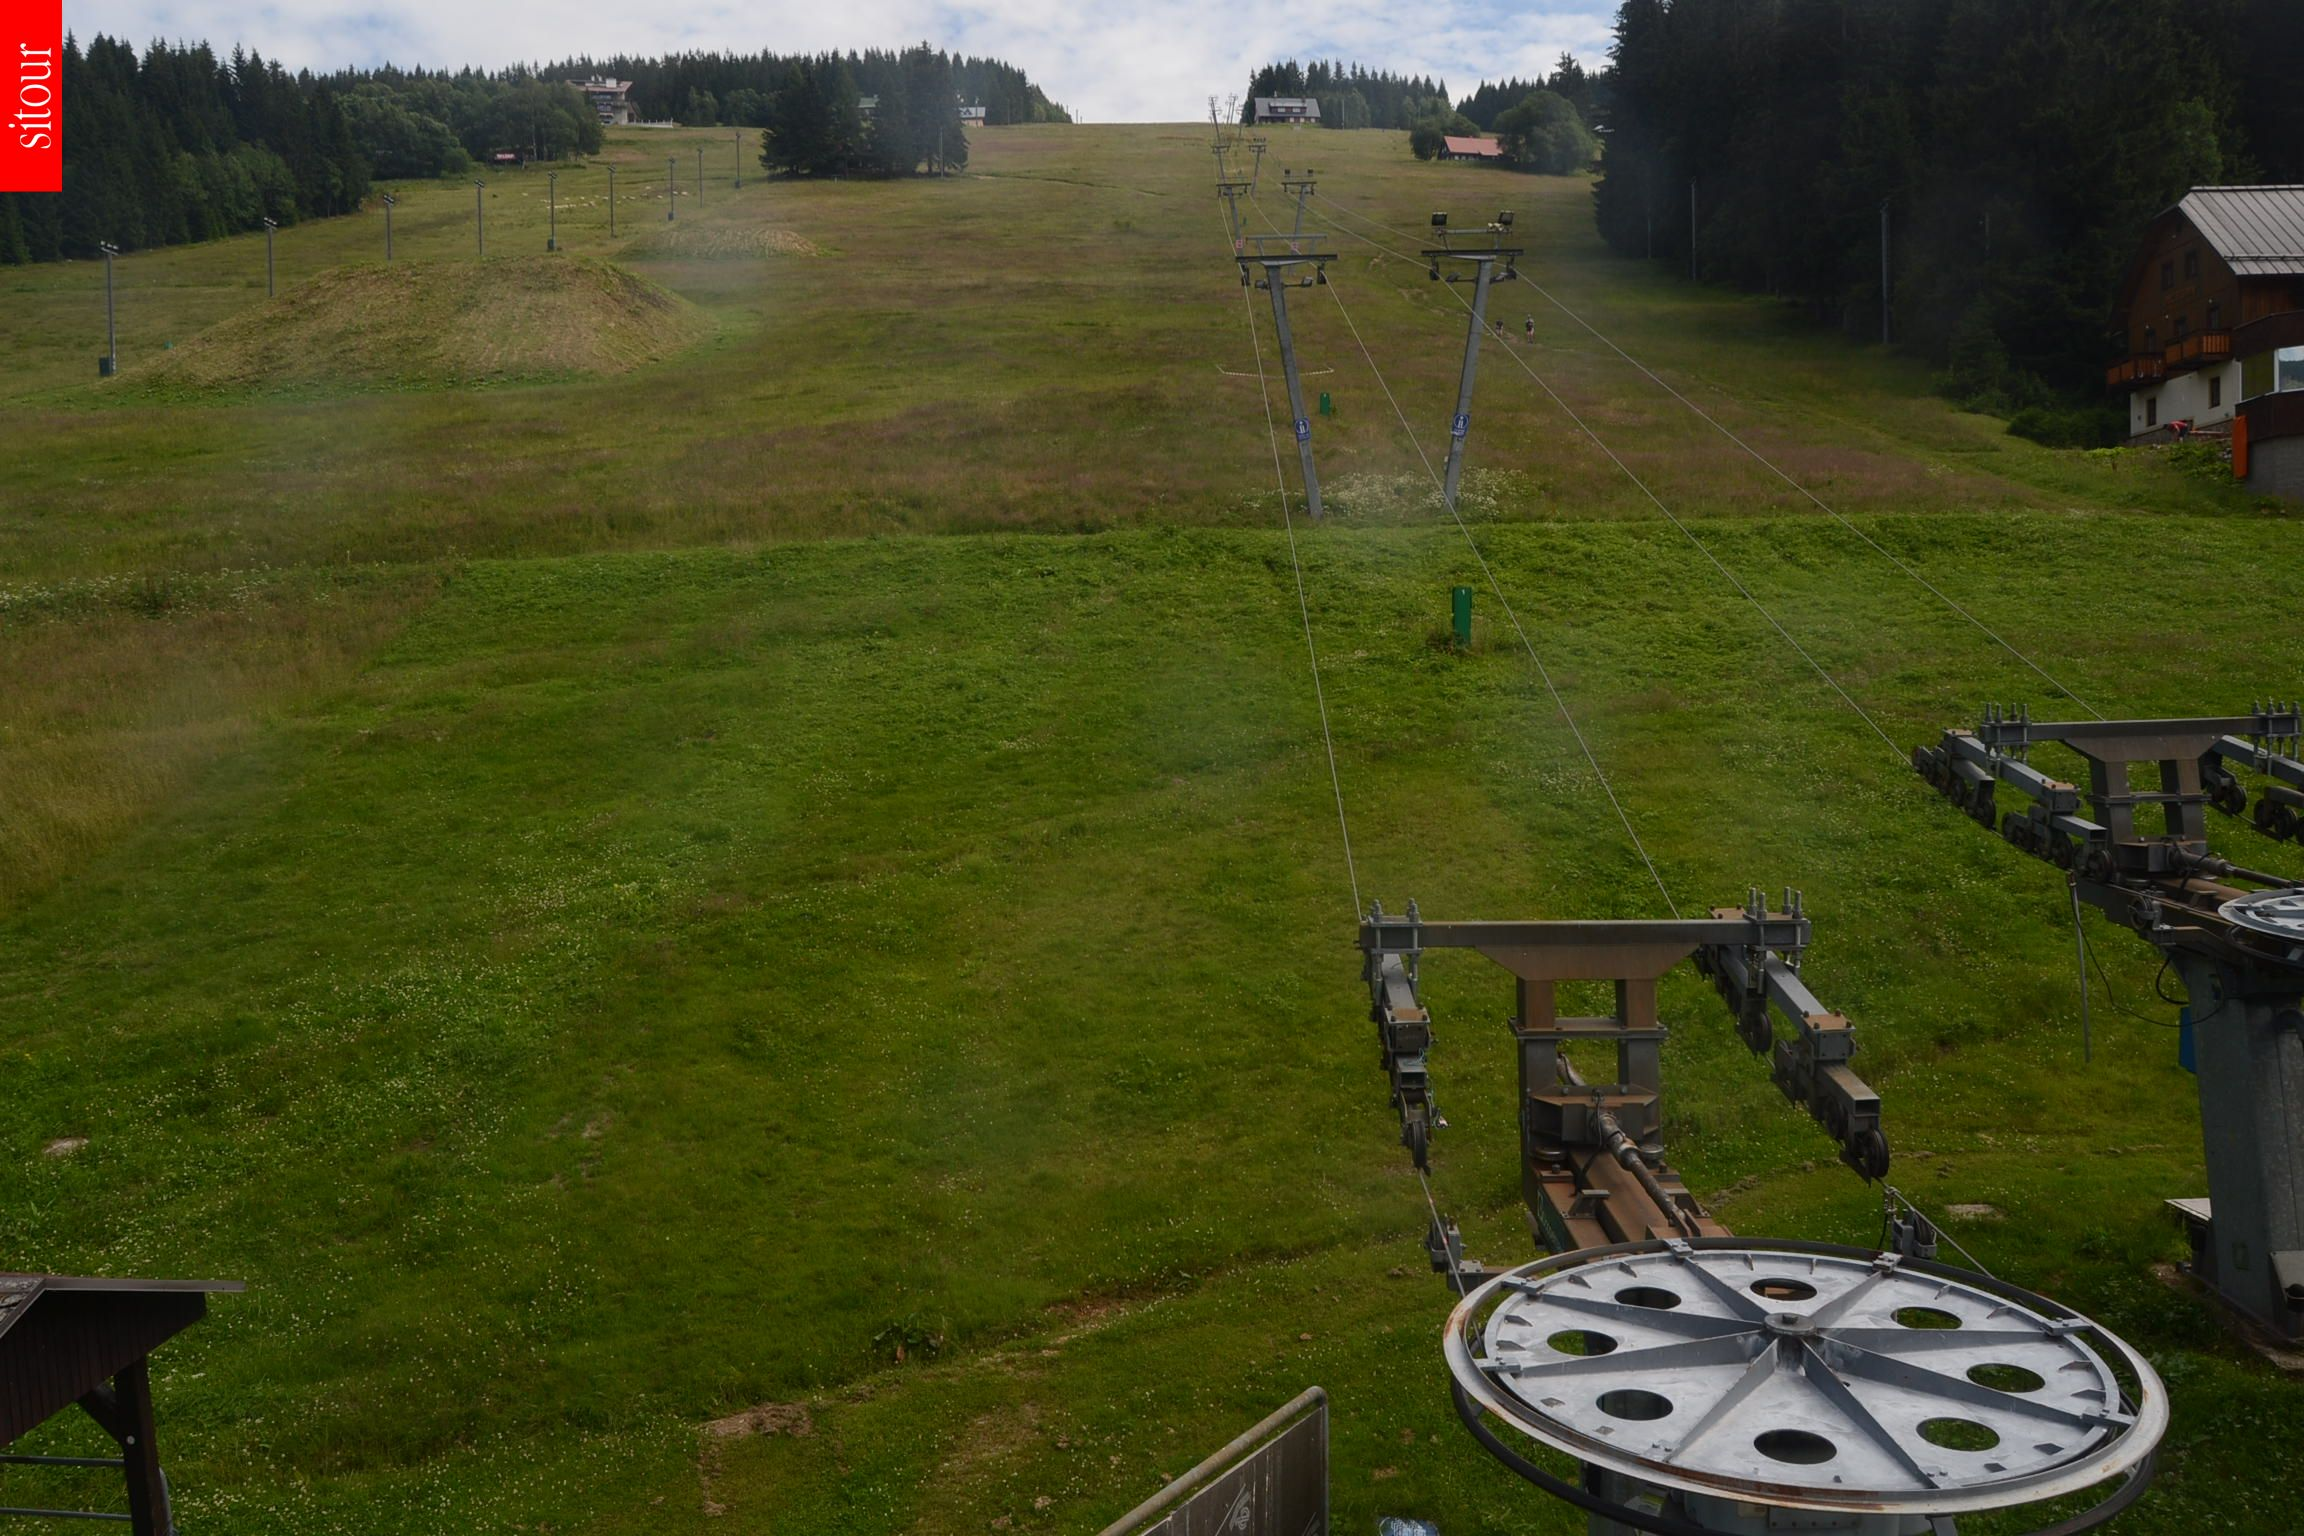 Kamera Pec pod Sněžkou - Javor